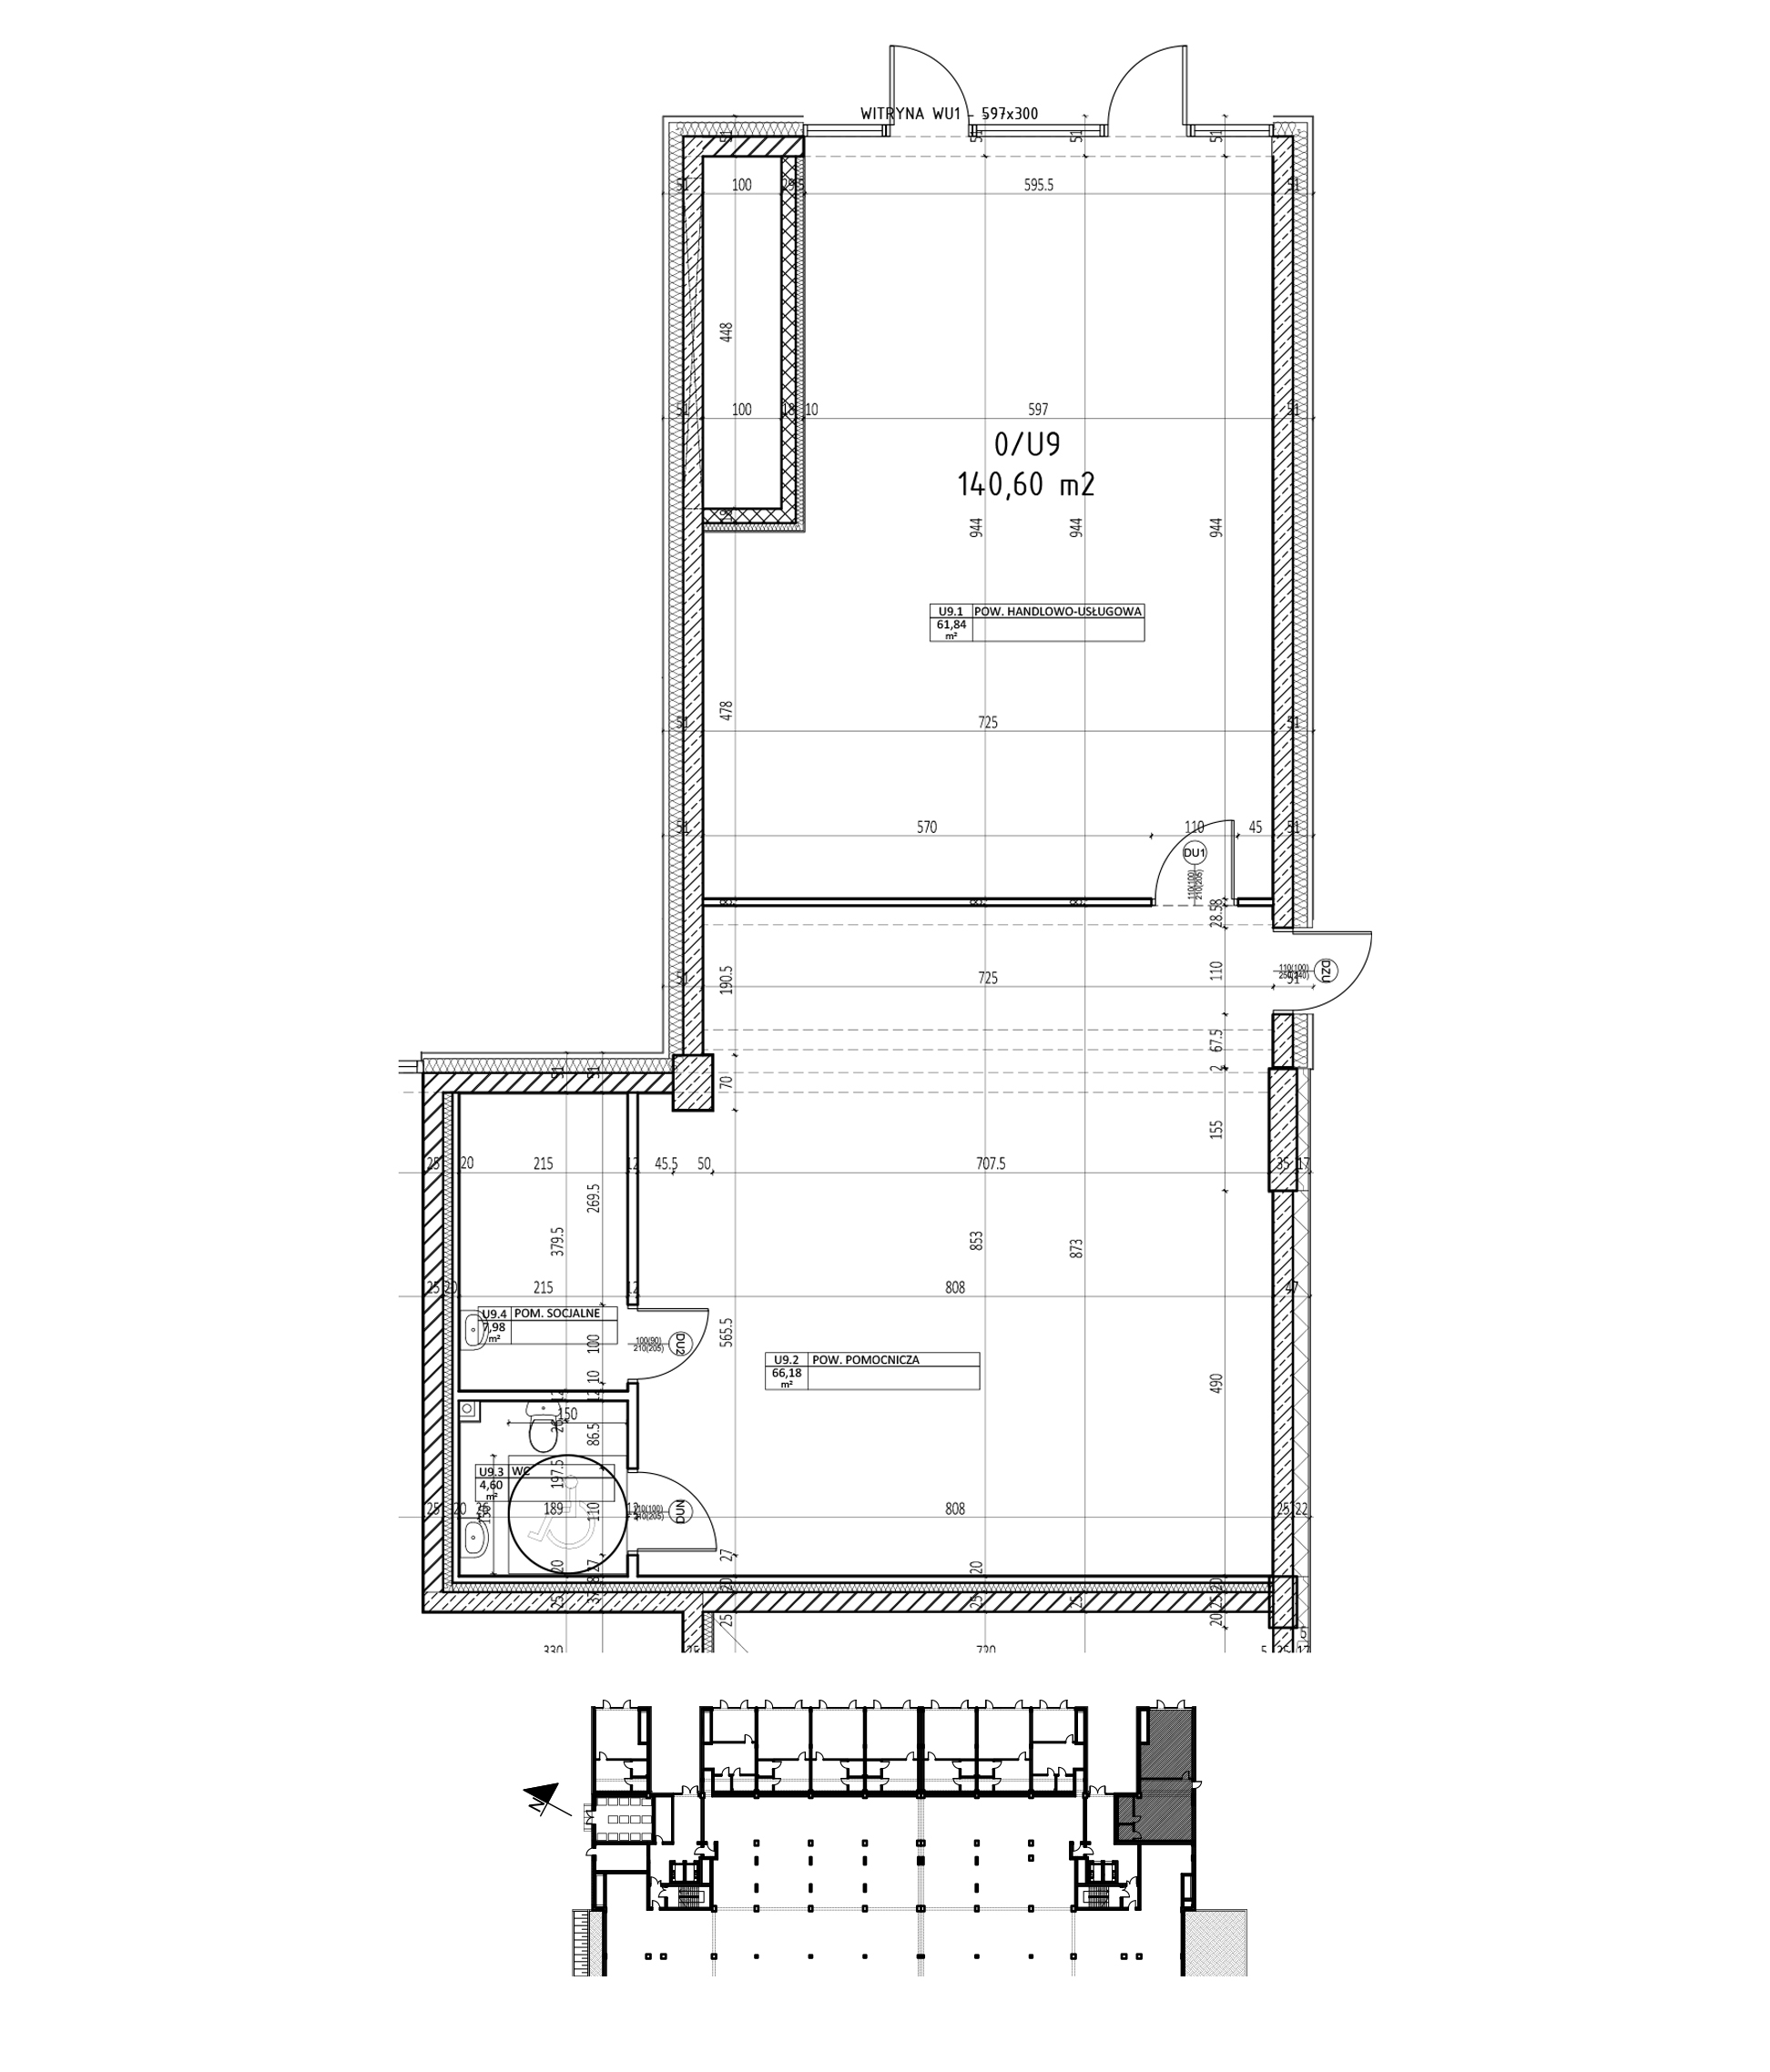 https://apartamentyjagiellonskie.pl/wp-content/uploads/2021/01/u9.jpg